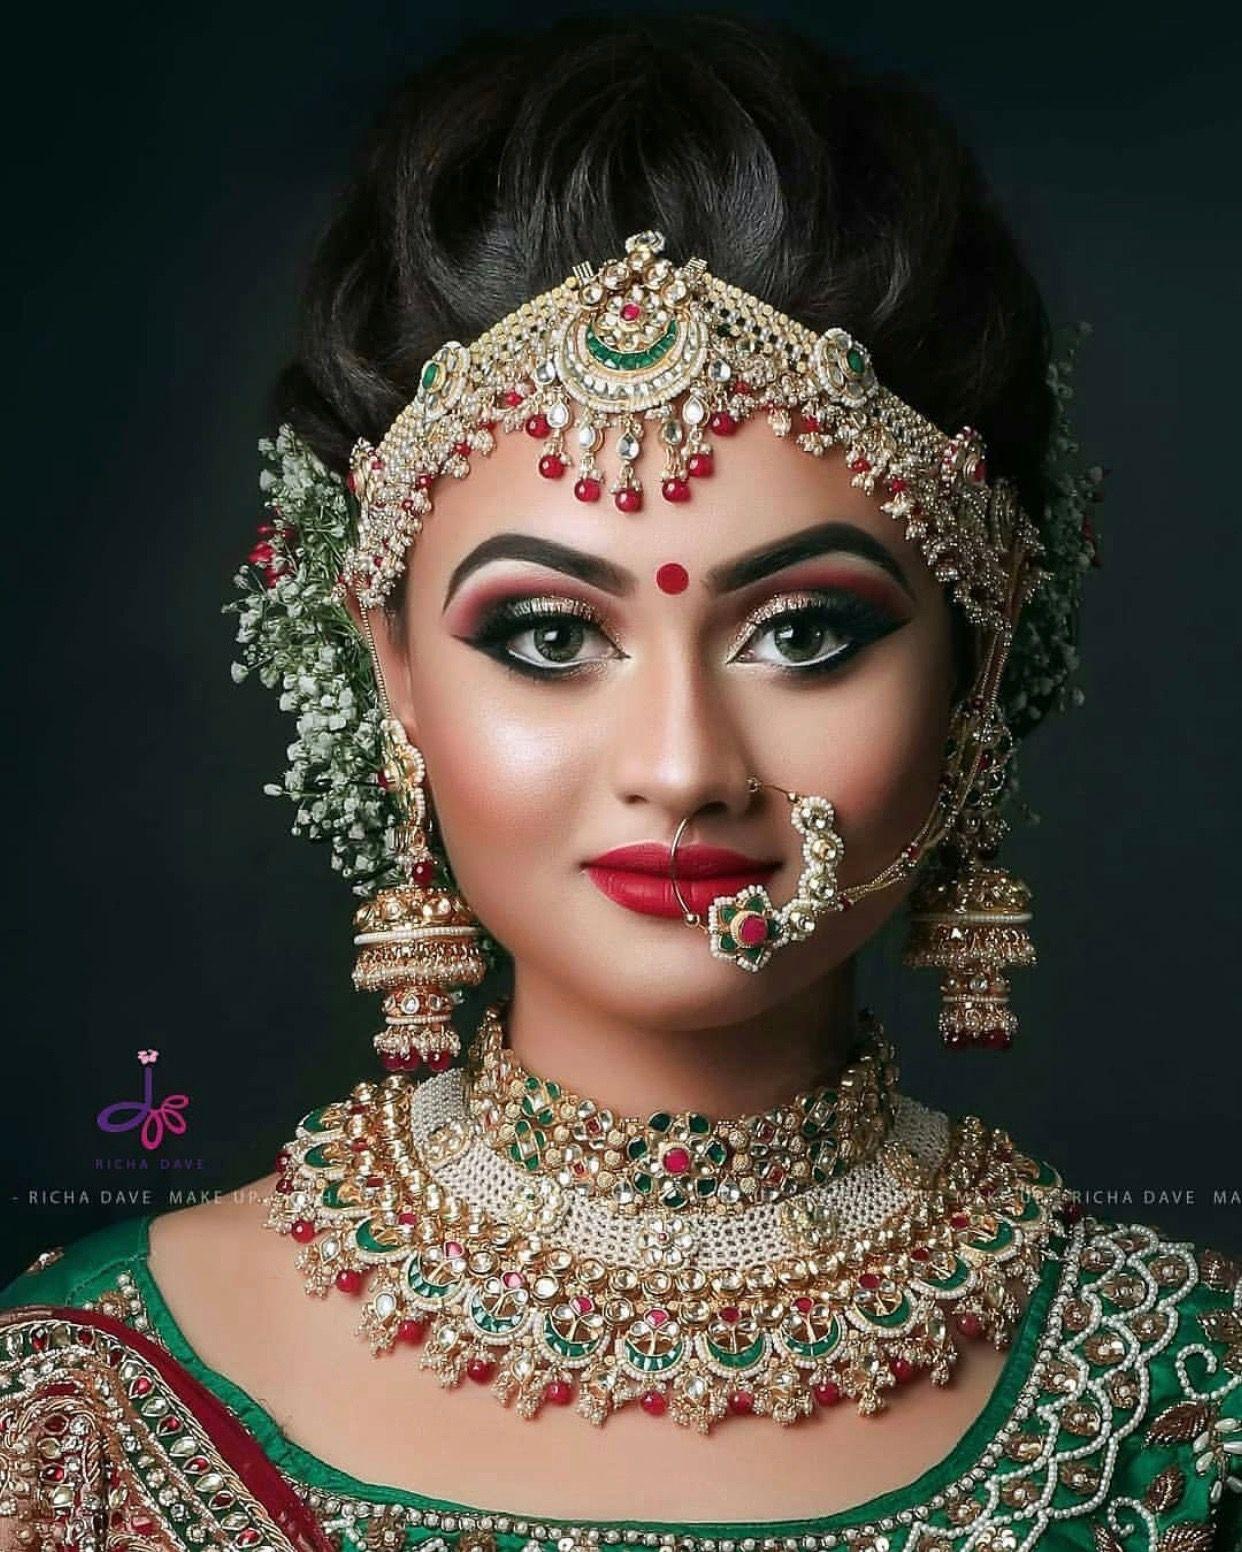 Pin by amrita rawat on indian bride pinterest indian bridal